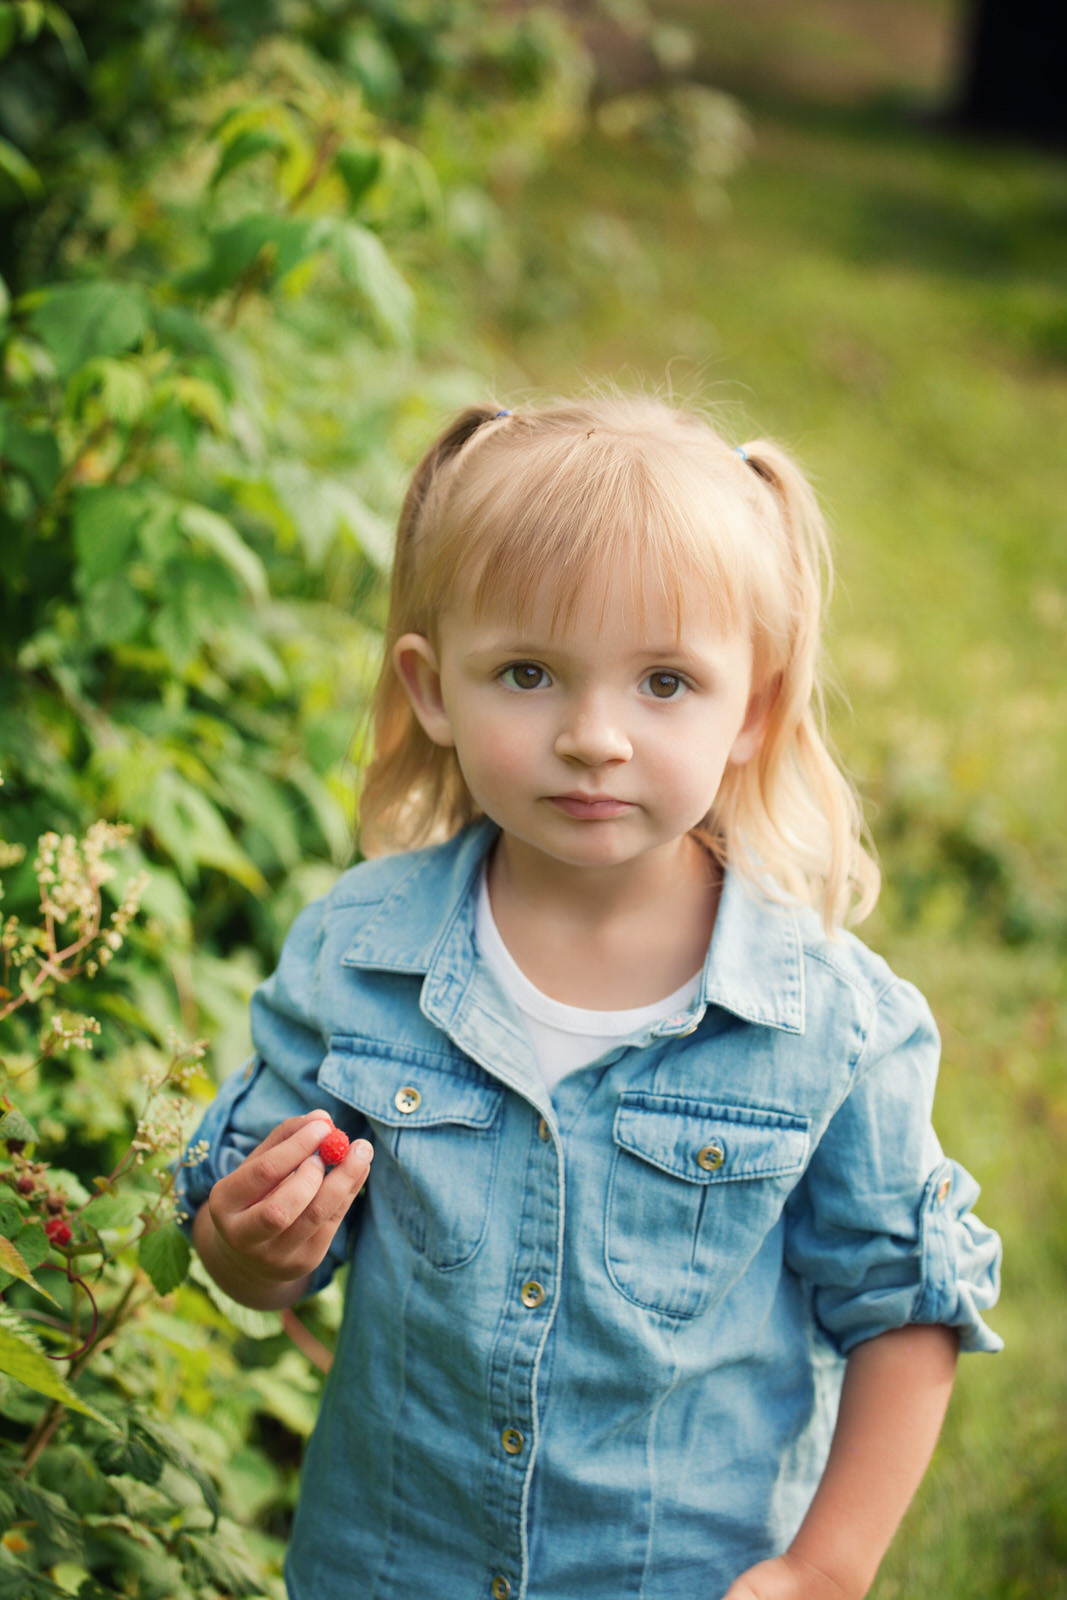 upper-peninsula-photographer-family-children-marquette-michigan-jackie-solomon-001.jpg